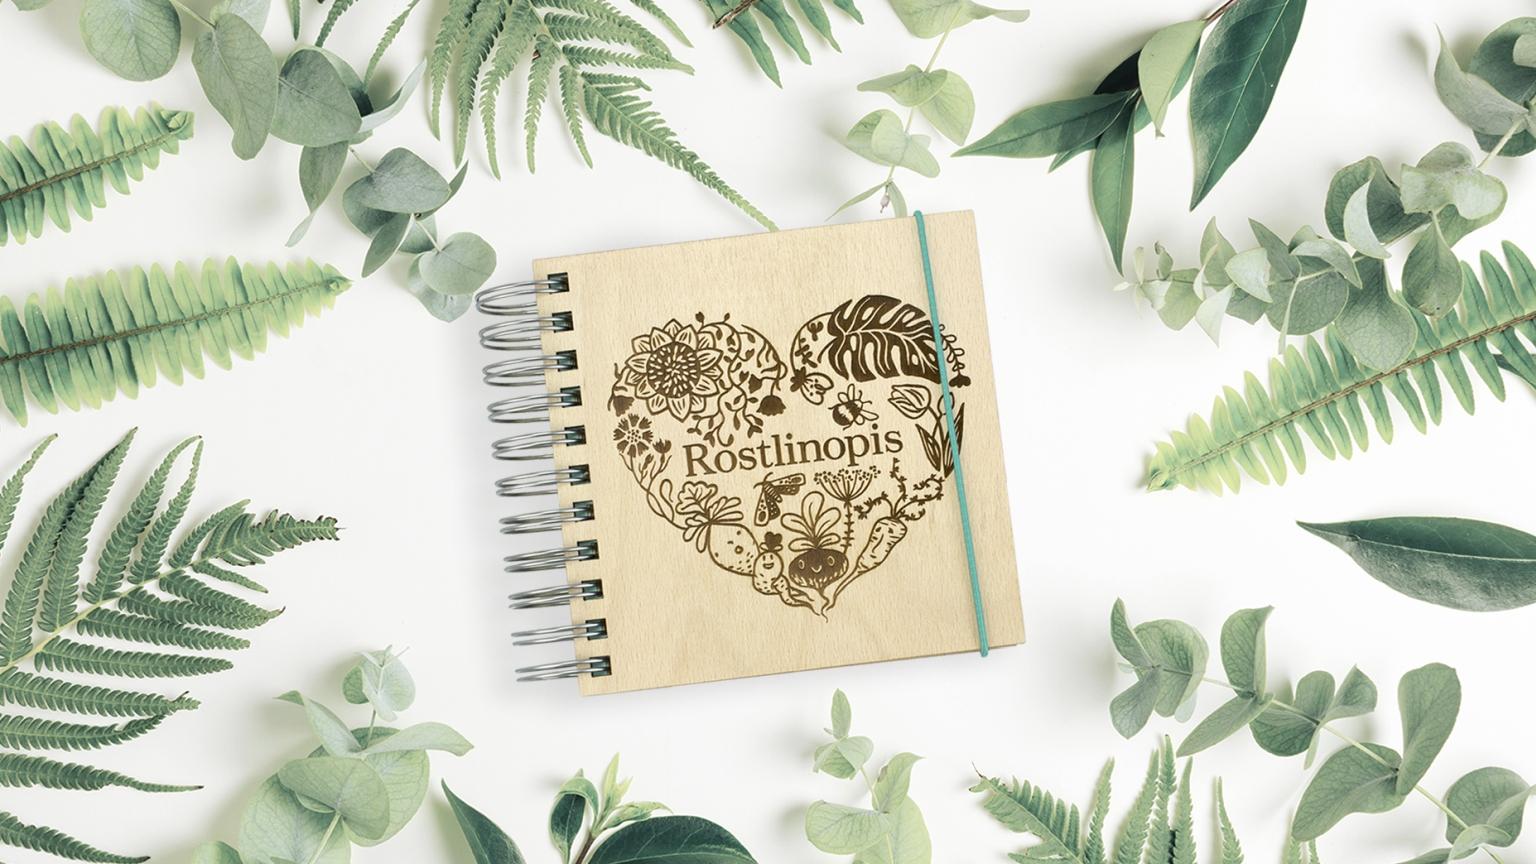 JAATY_woodbook_rostlinopis